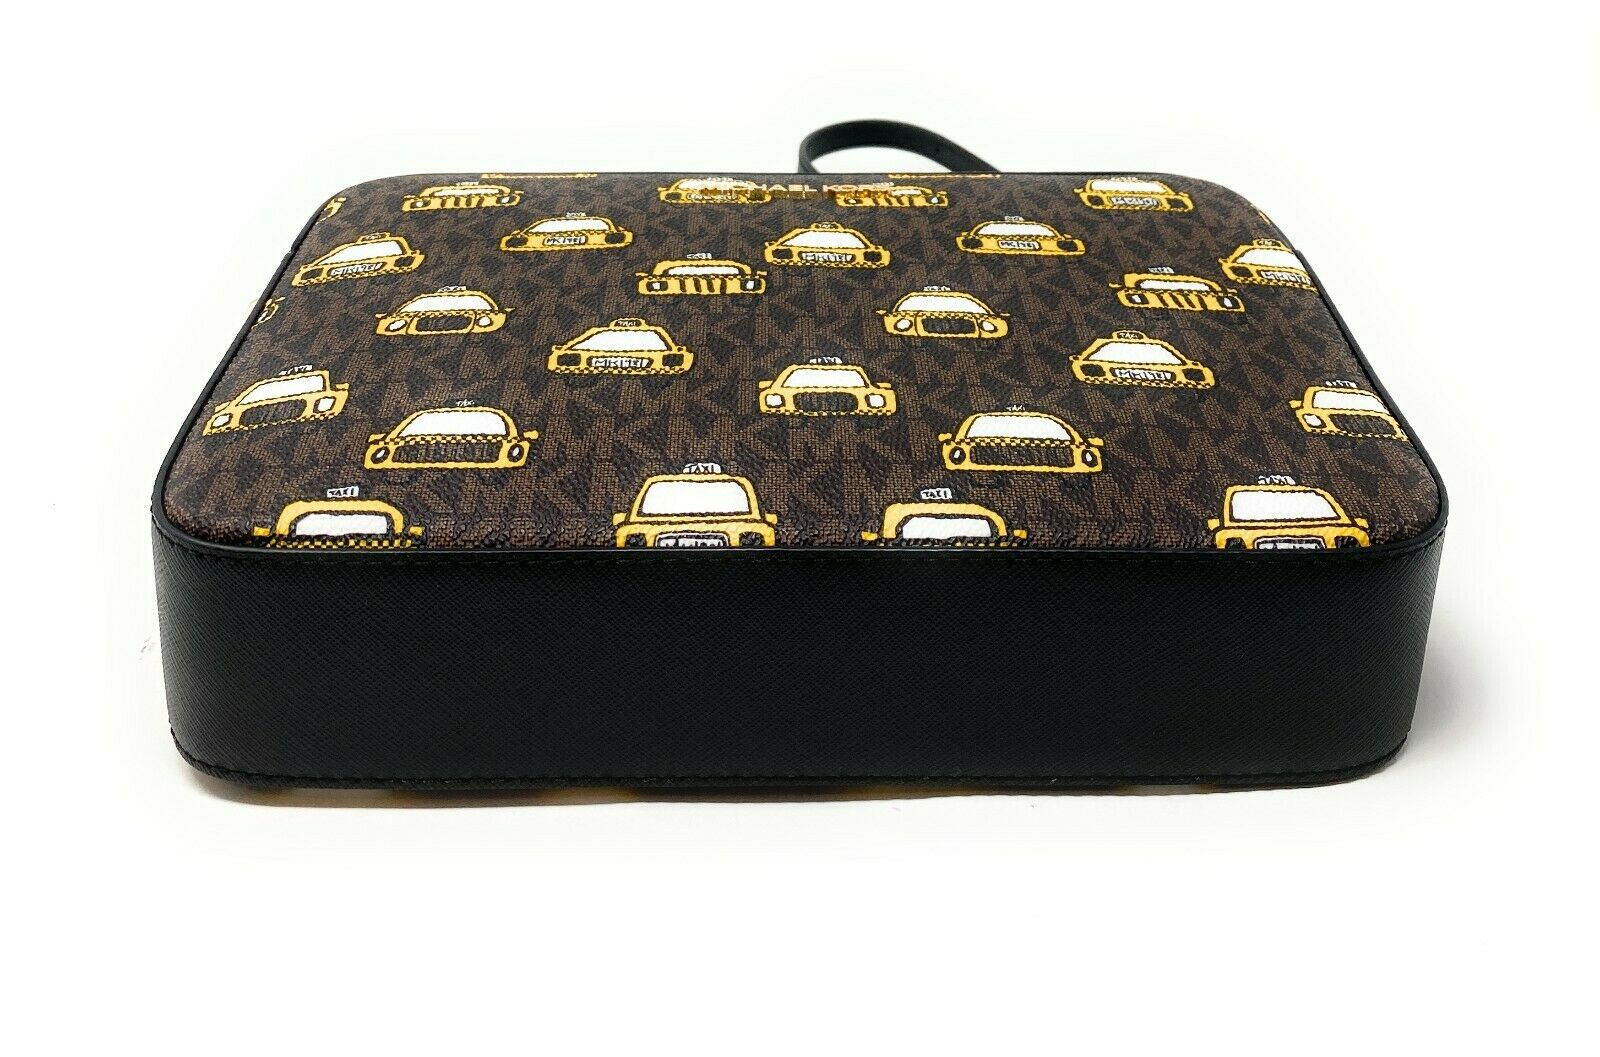 thumbnail 42 - Michael Kors Jet Set Item Large East West Crossbody Chain Handbag Clutch $298